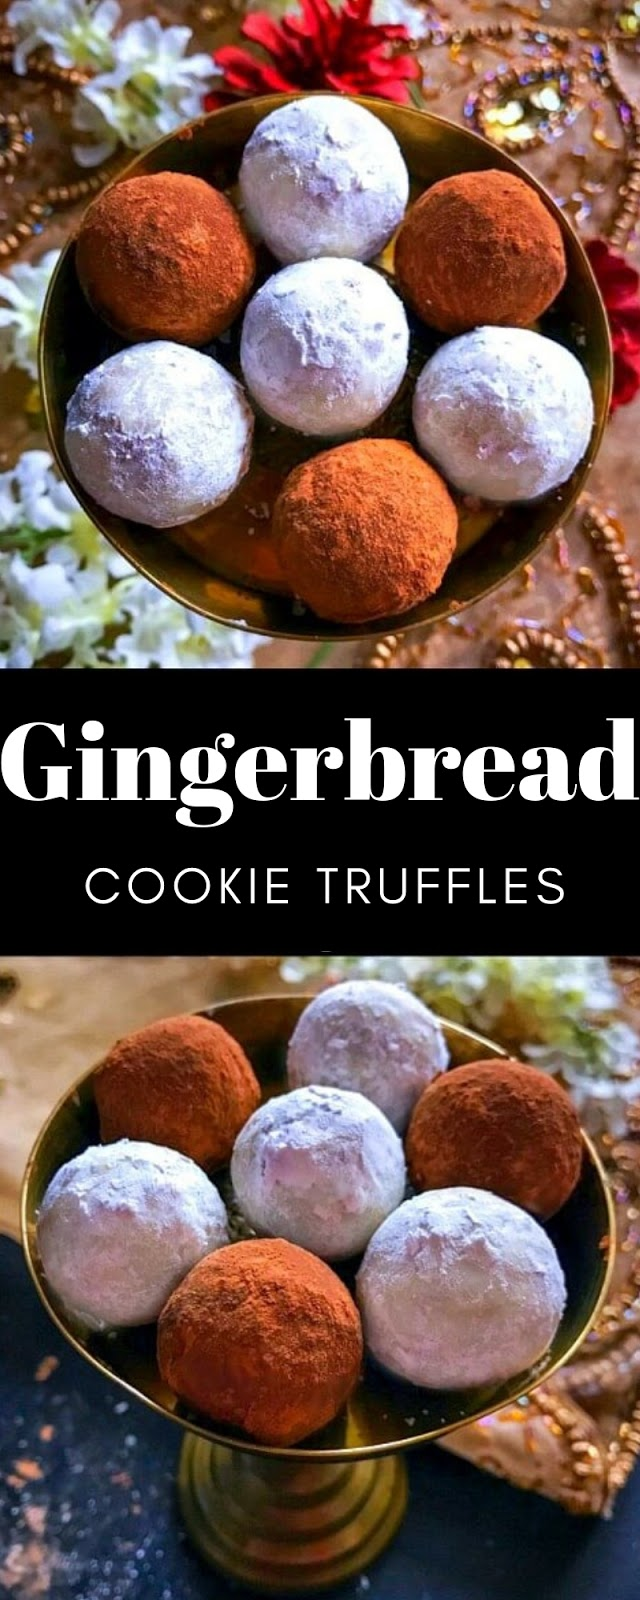 Gingerbread Cookie Truffles